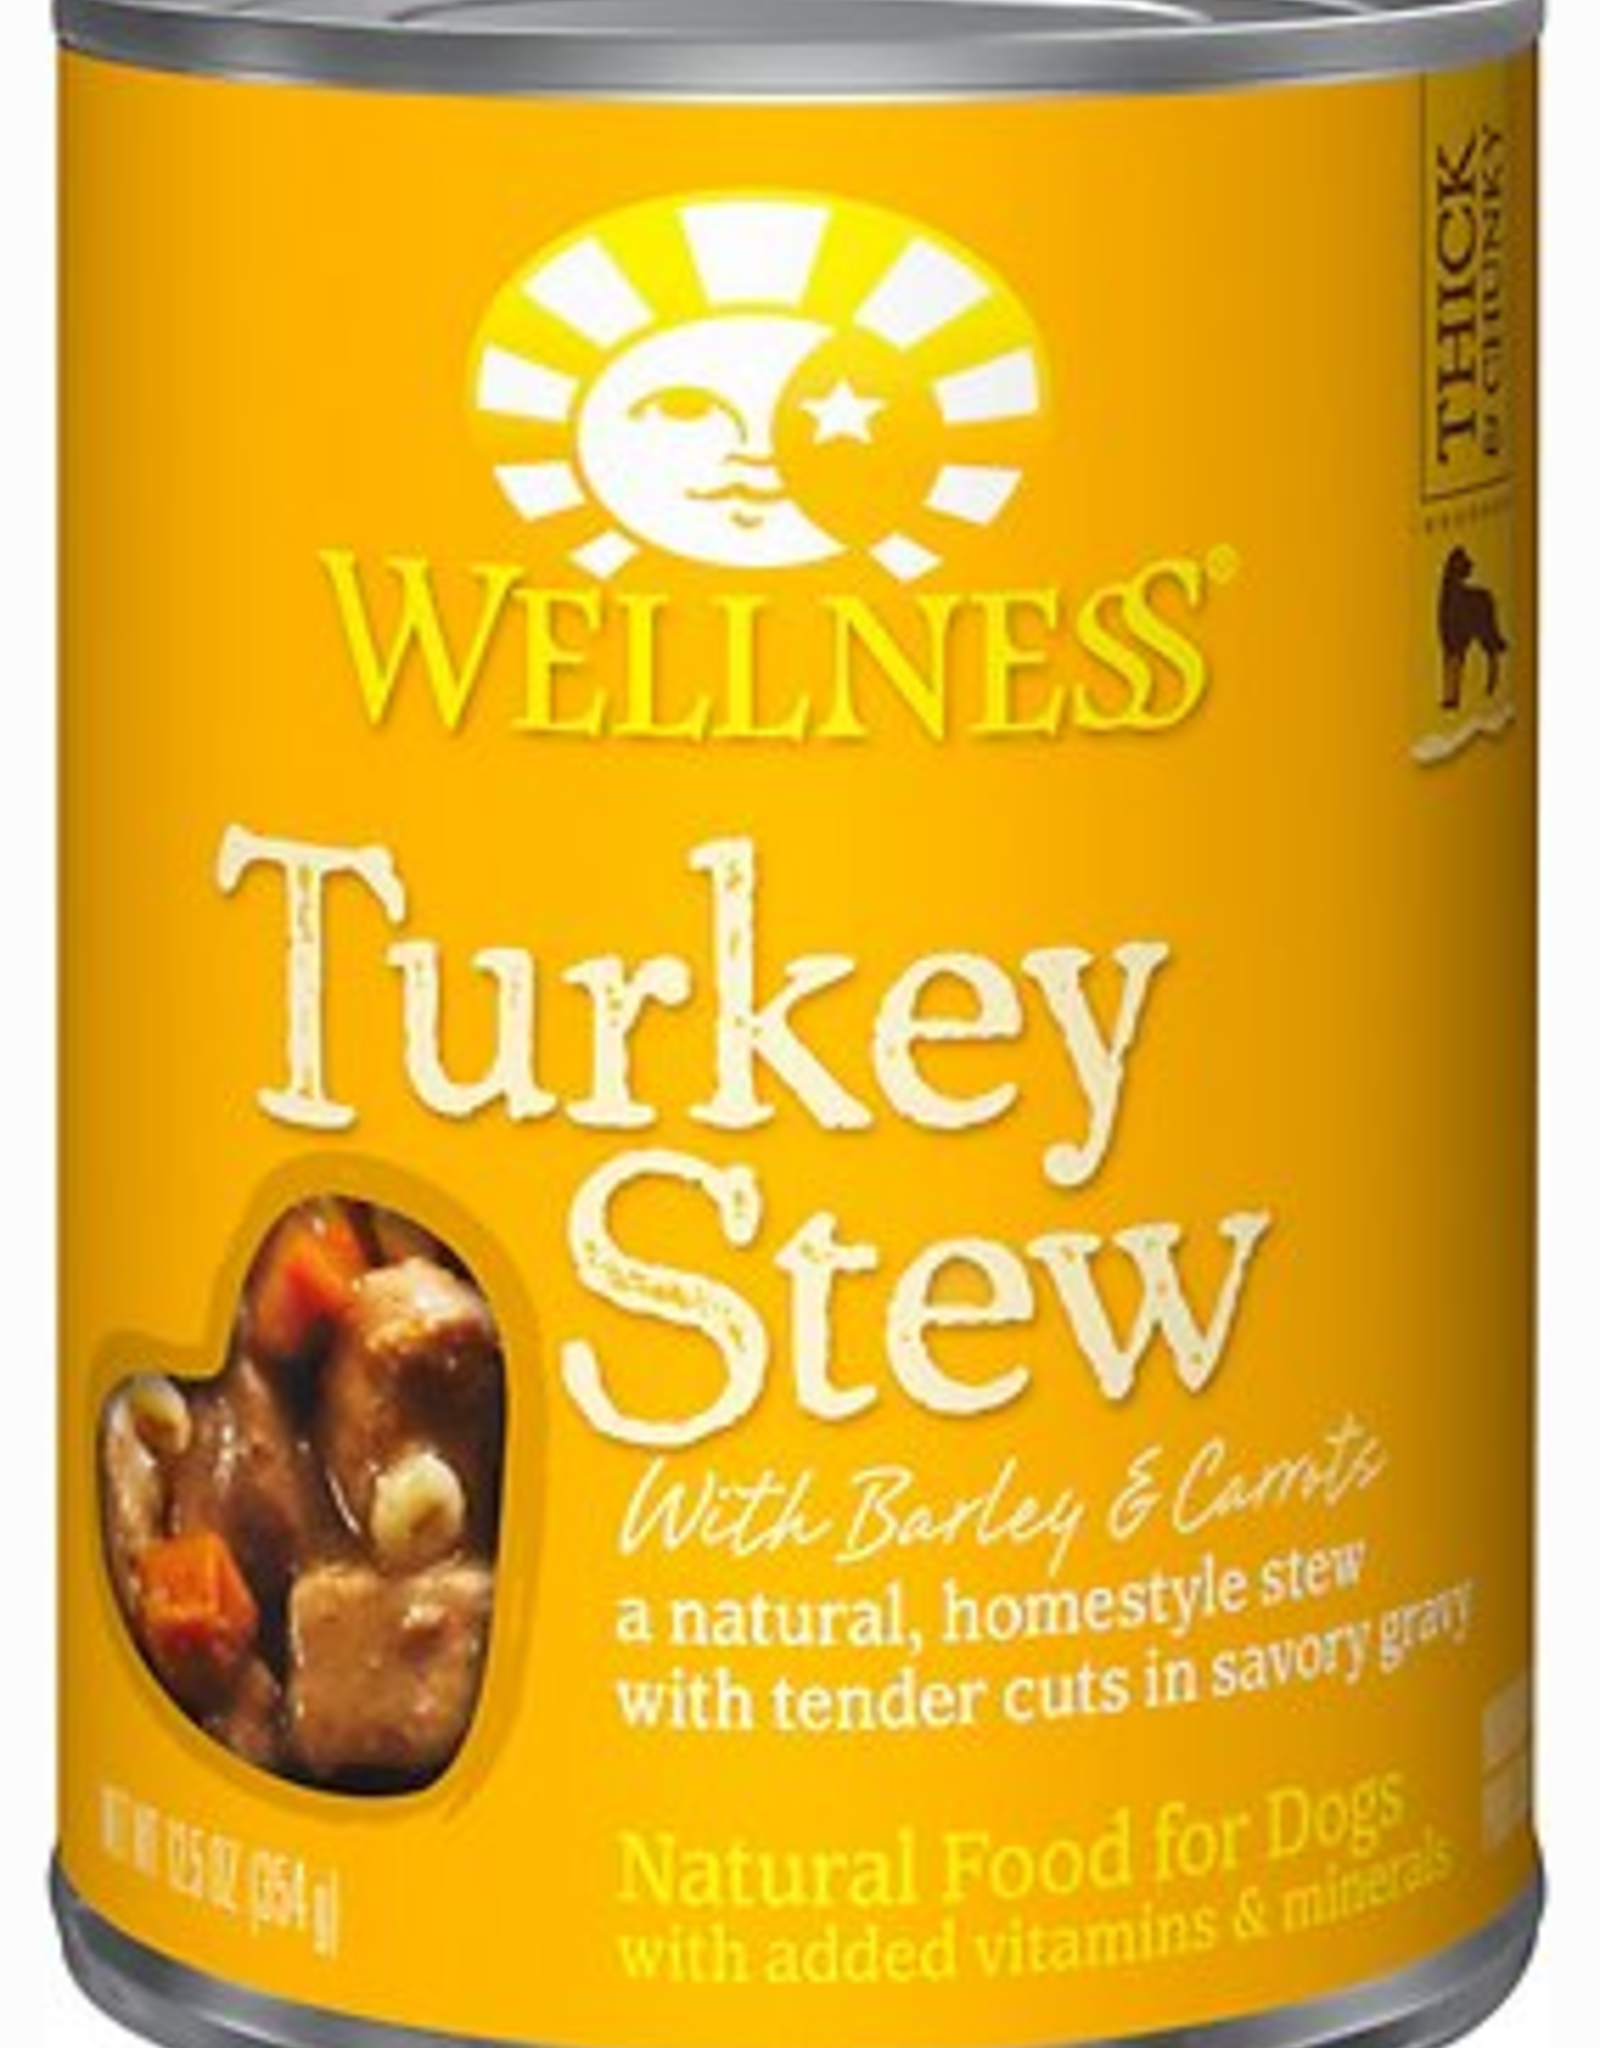 Wellness Turkey Stew with Barley & Carrots Canned Dog Food, 12.5 oz.